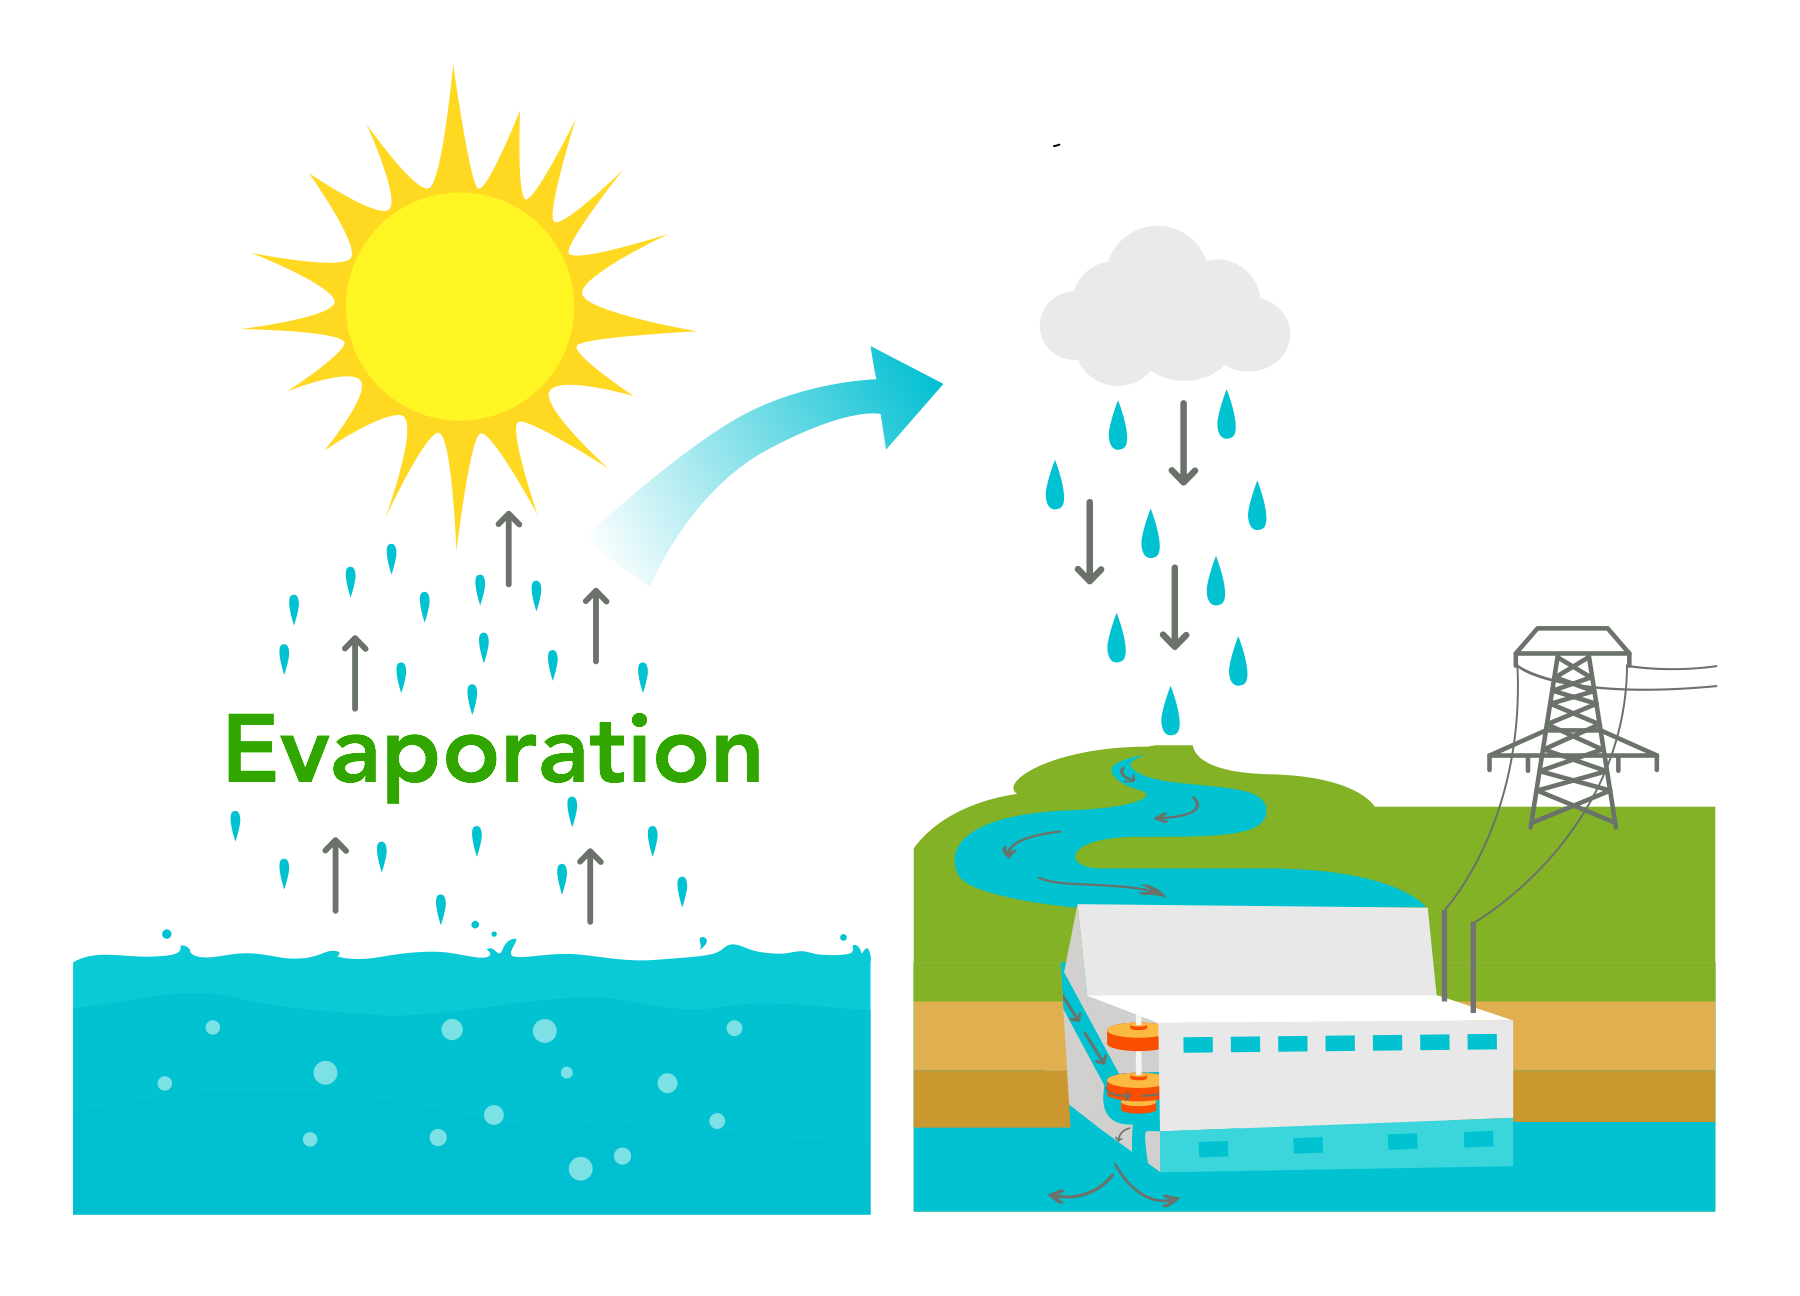 solar sunlight evaporates water river dam hydropower hydroelectric